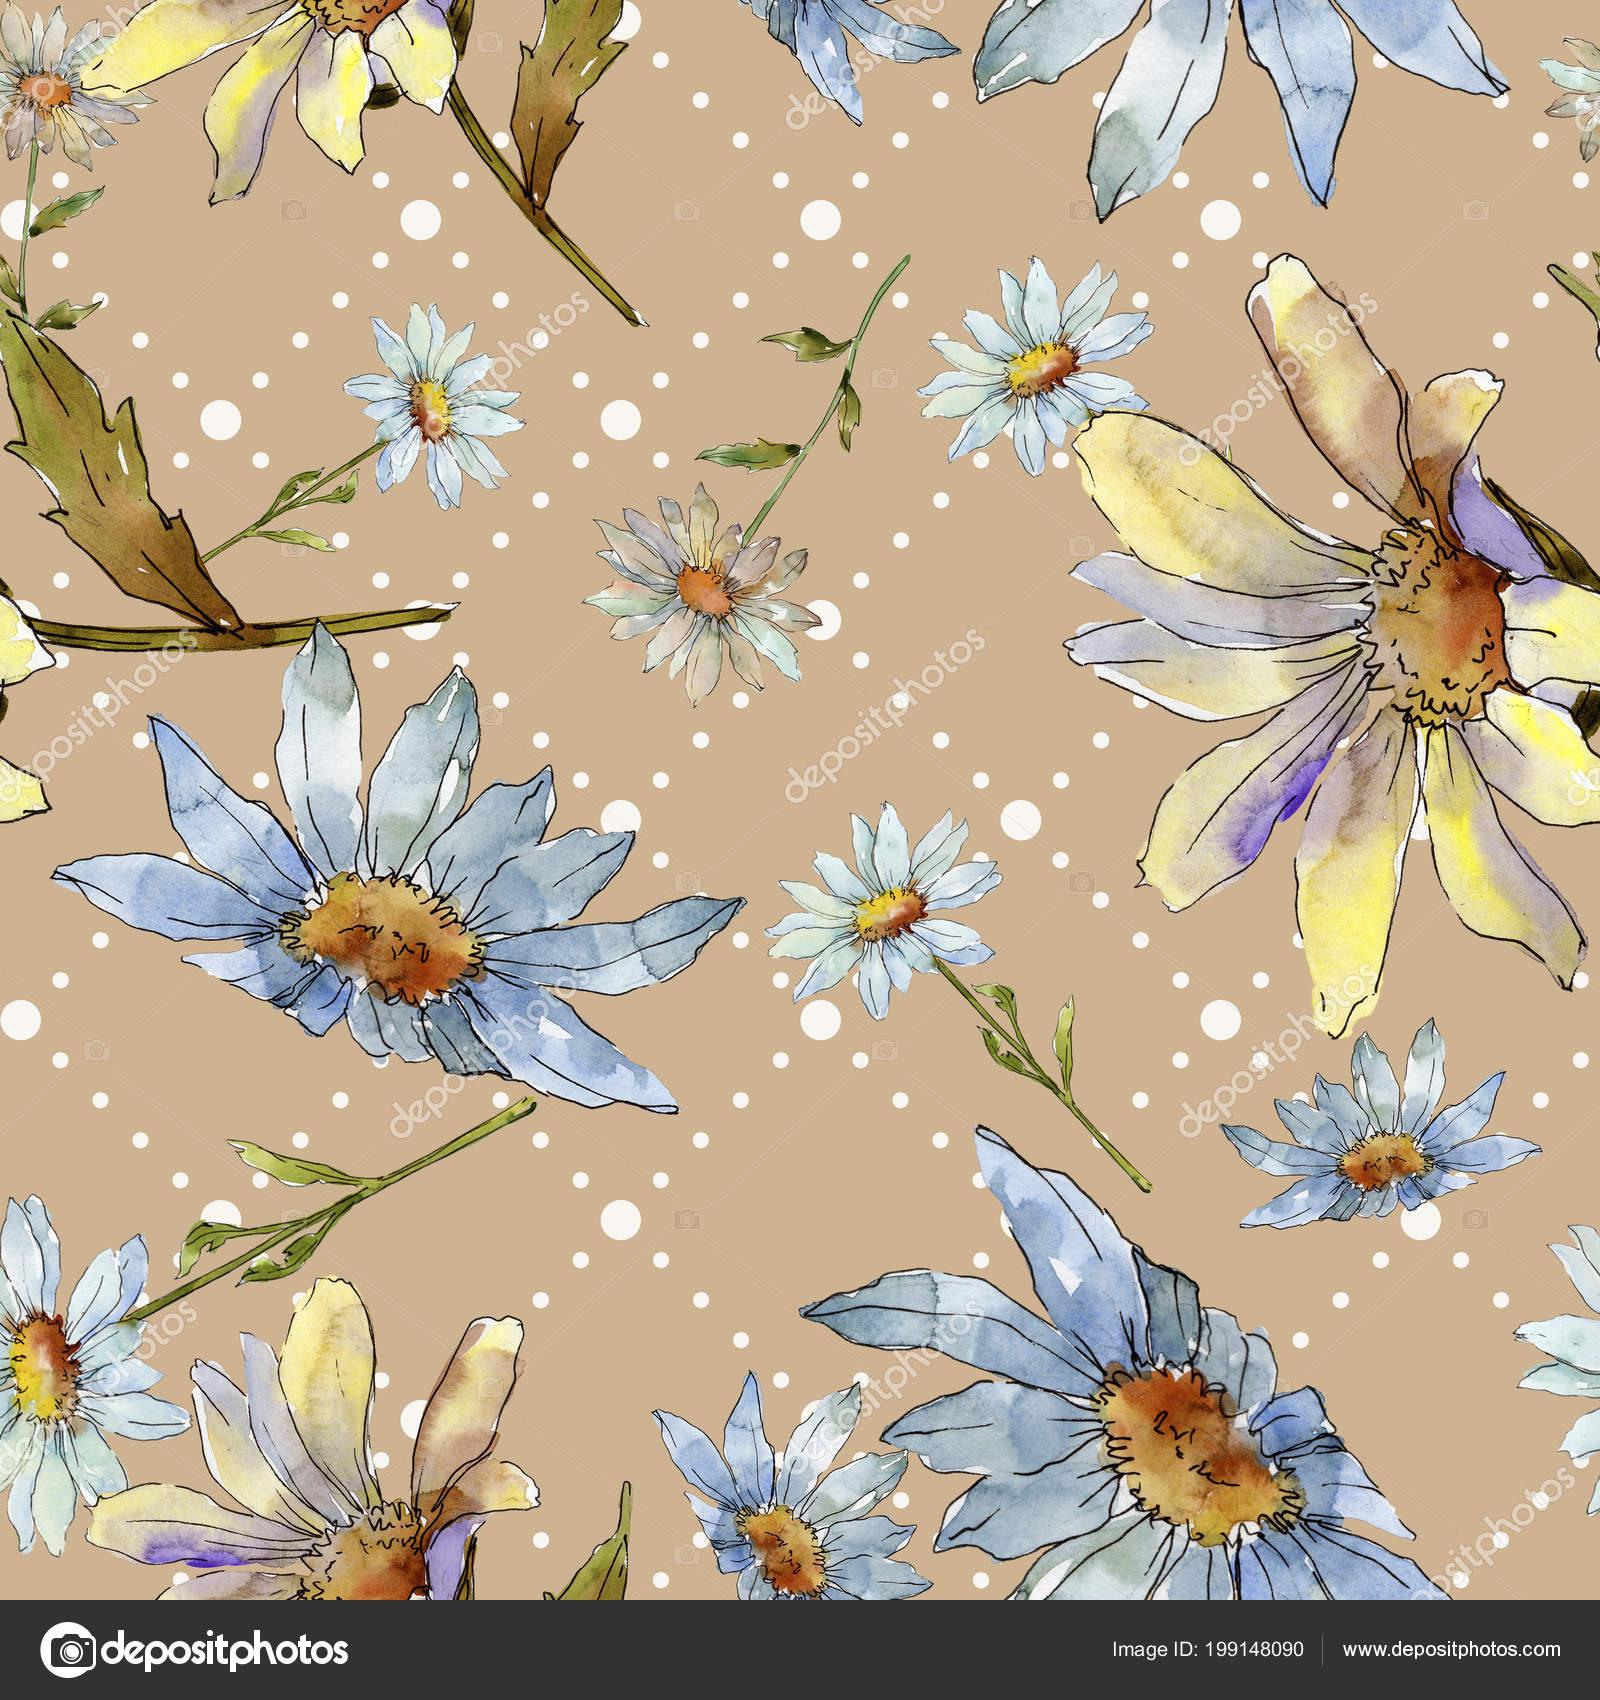 Wildflower Daisy Floral Botanical Flower Seamless Background